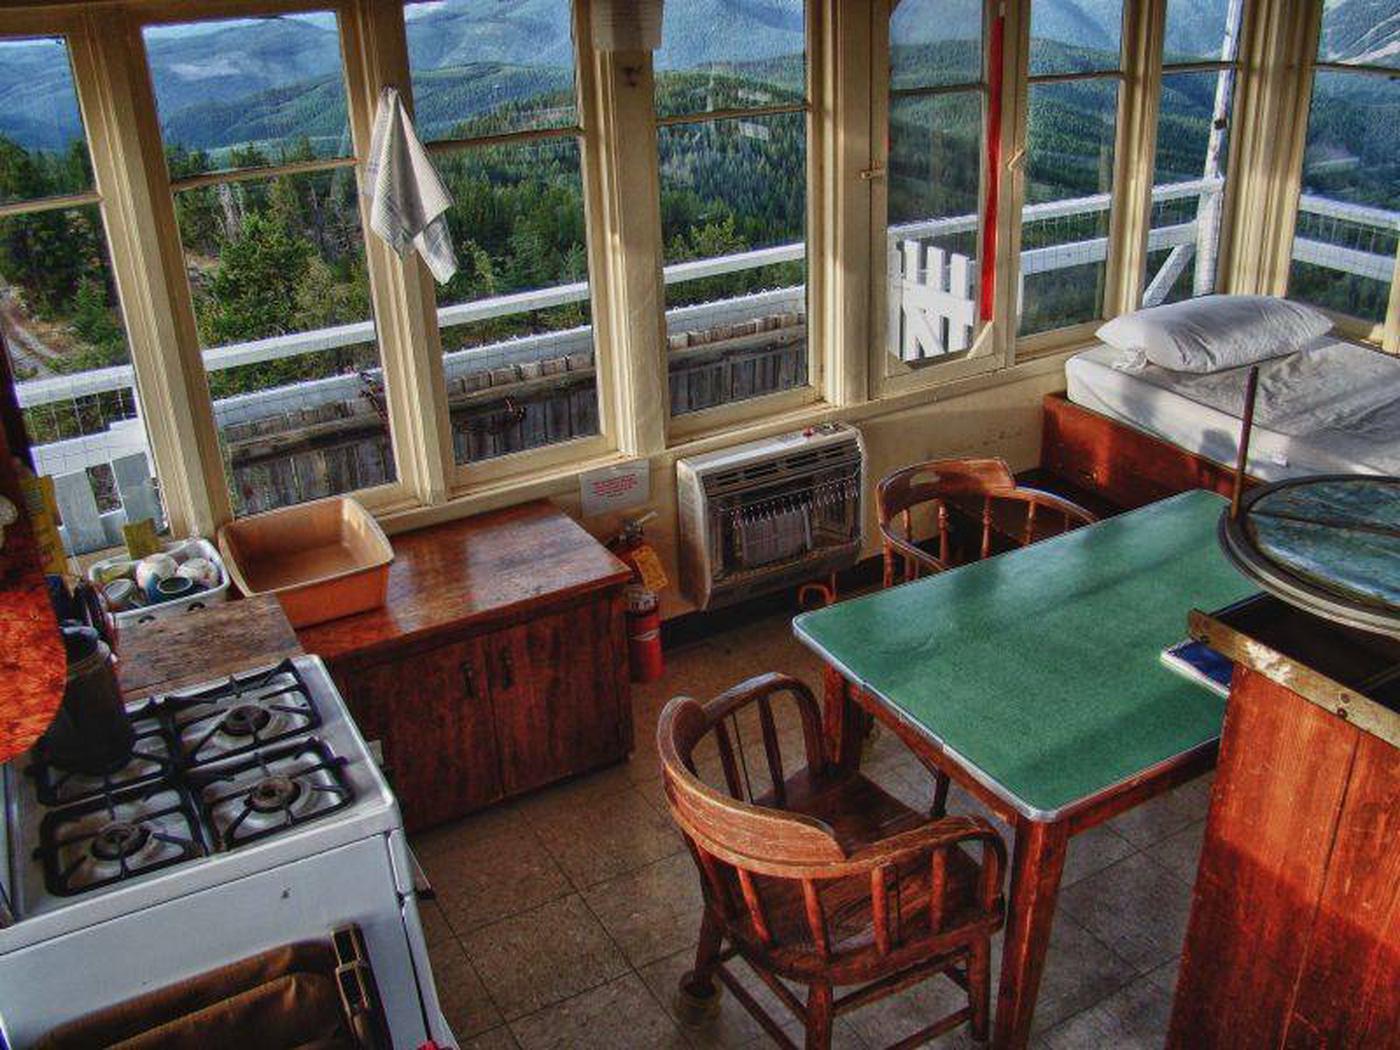 Mt. Baldy-Buckhorn Ridge Lookout table and stove